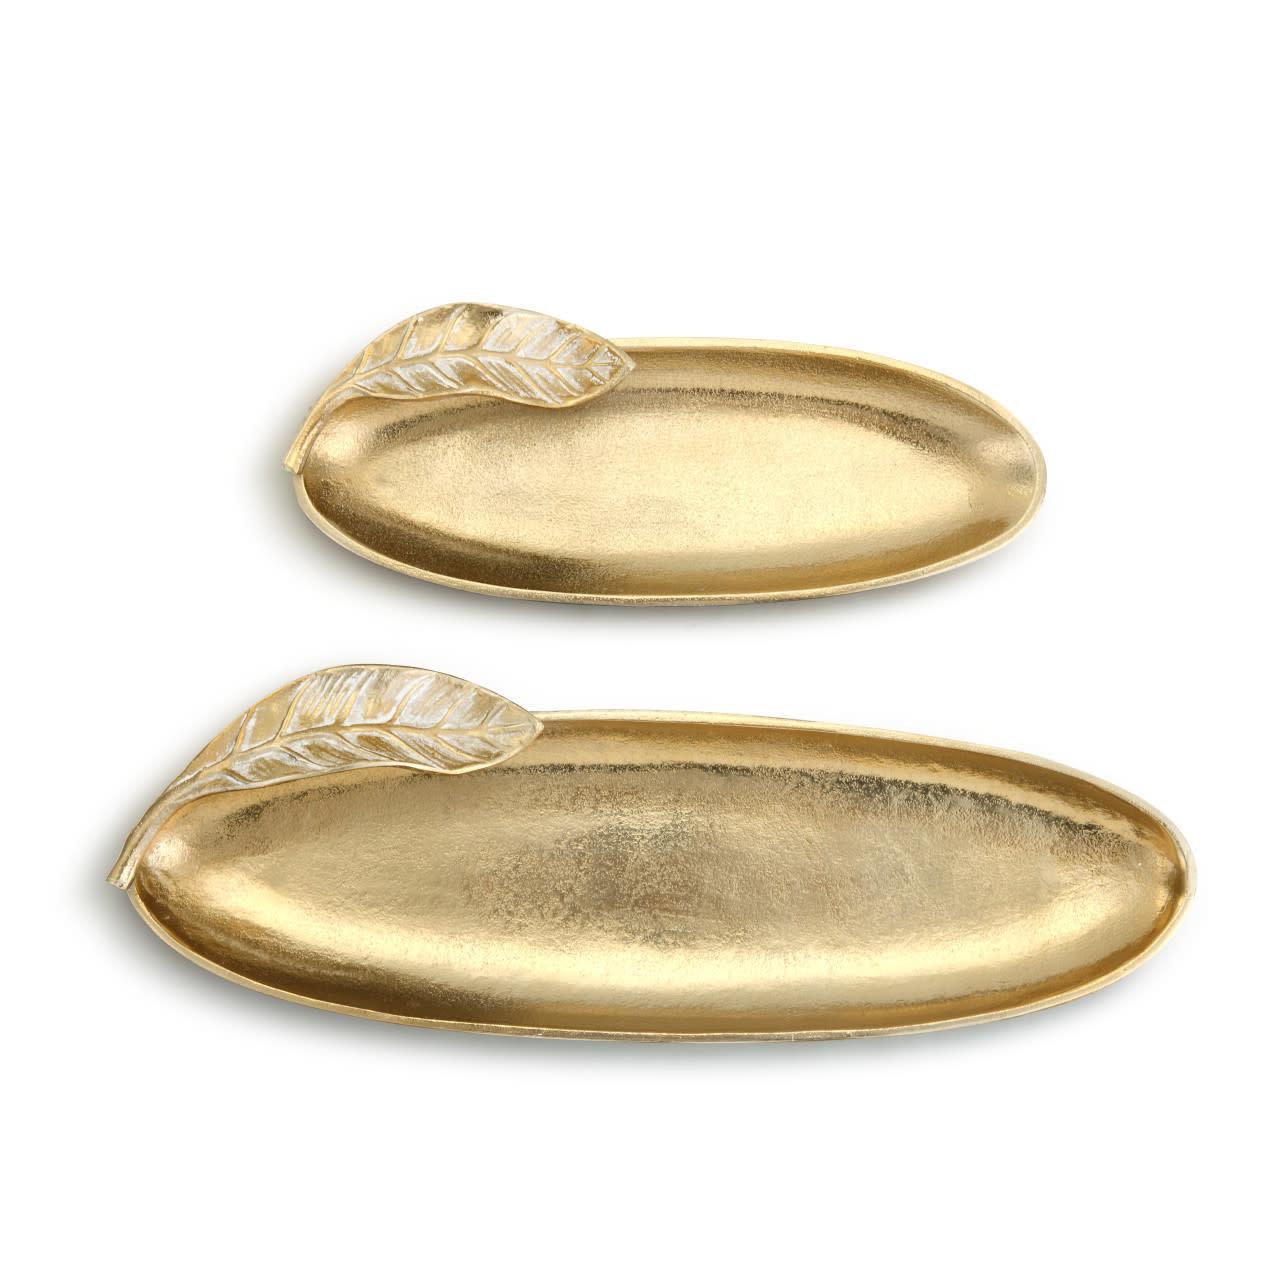 Lori Seibert Gold Leaf Tray